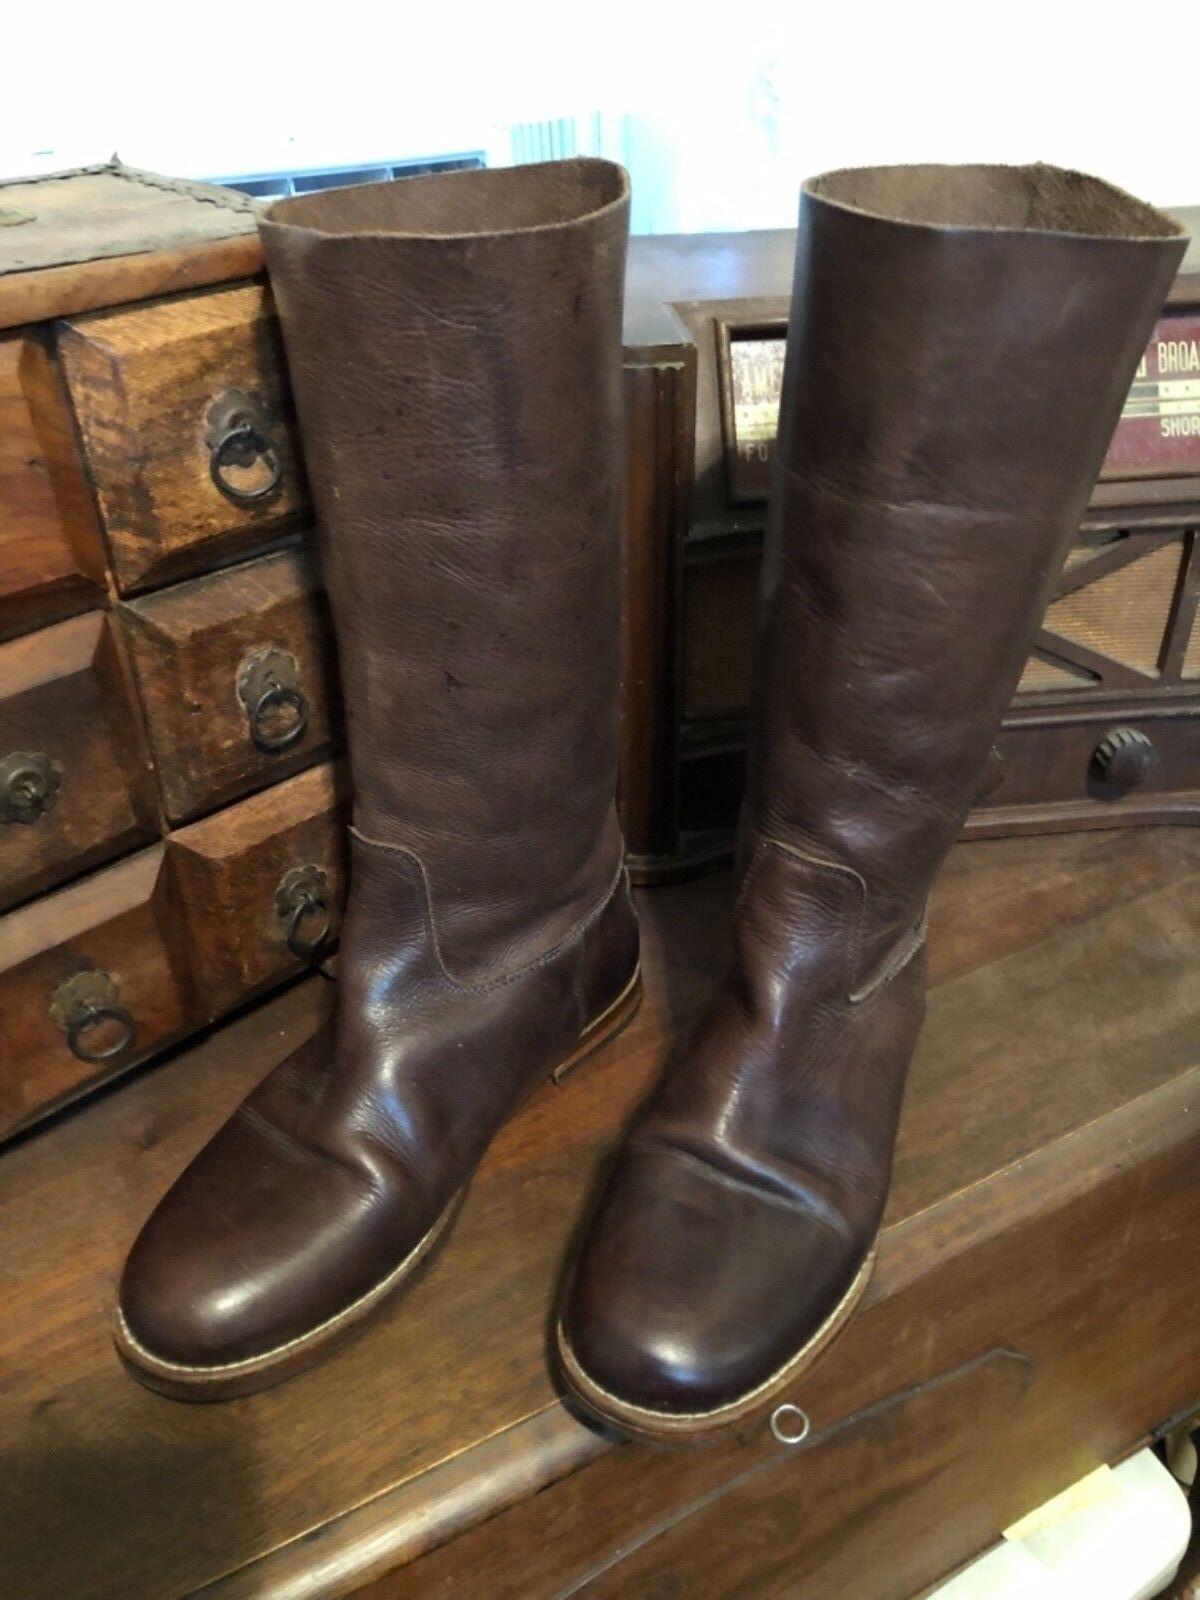 Shabbies Amsterdam Leather Boots Size EU38 US7-7.5 UK5.5